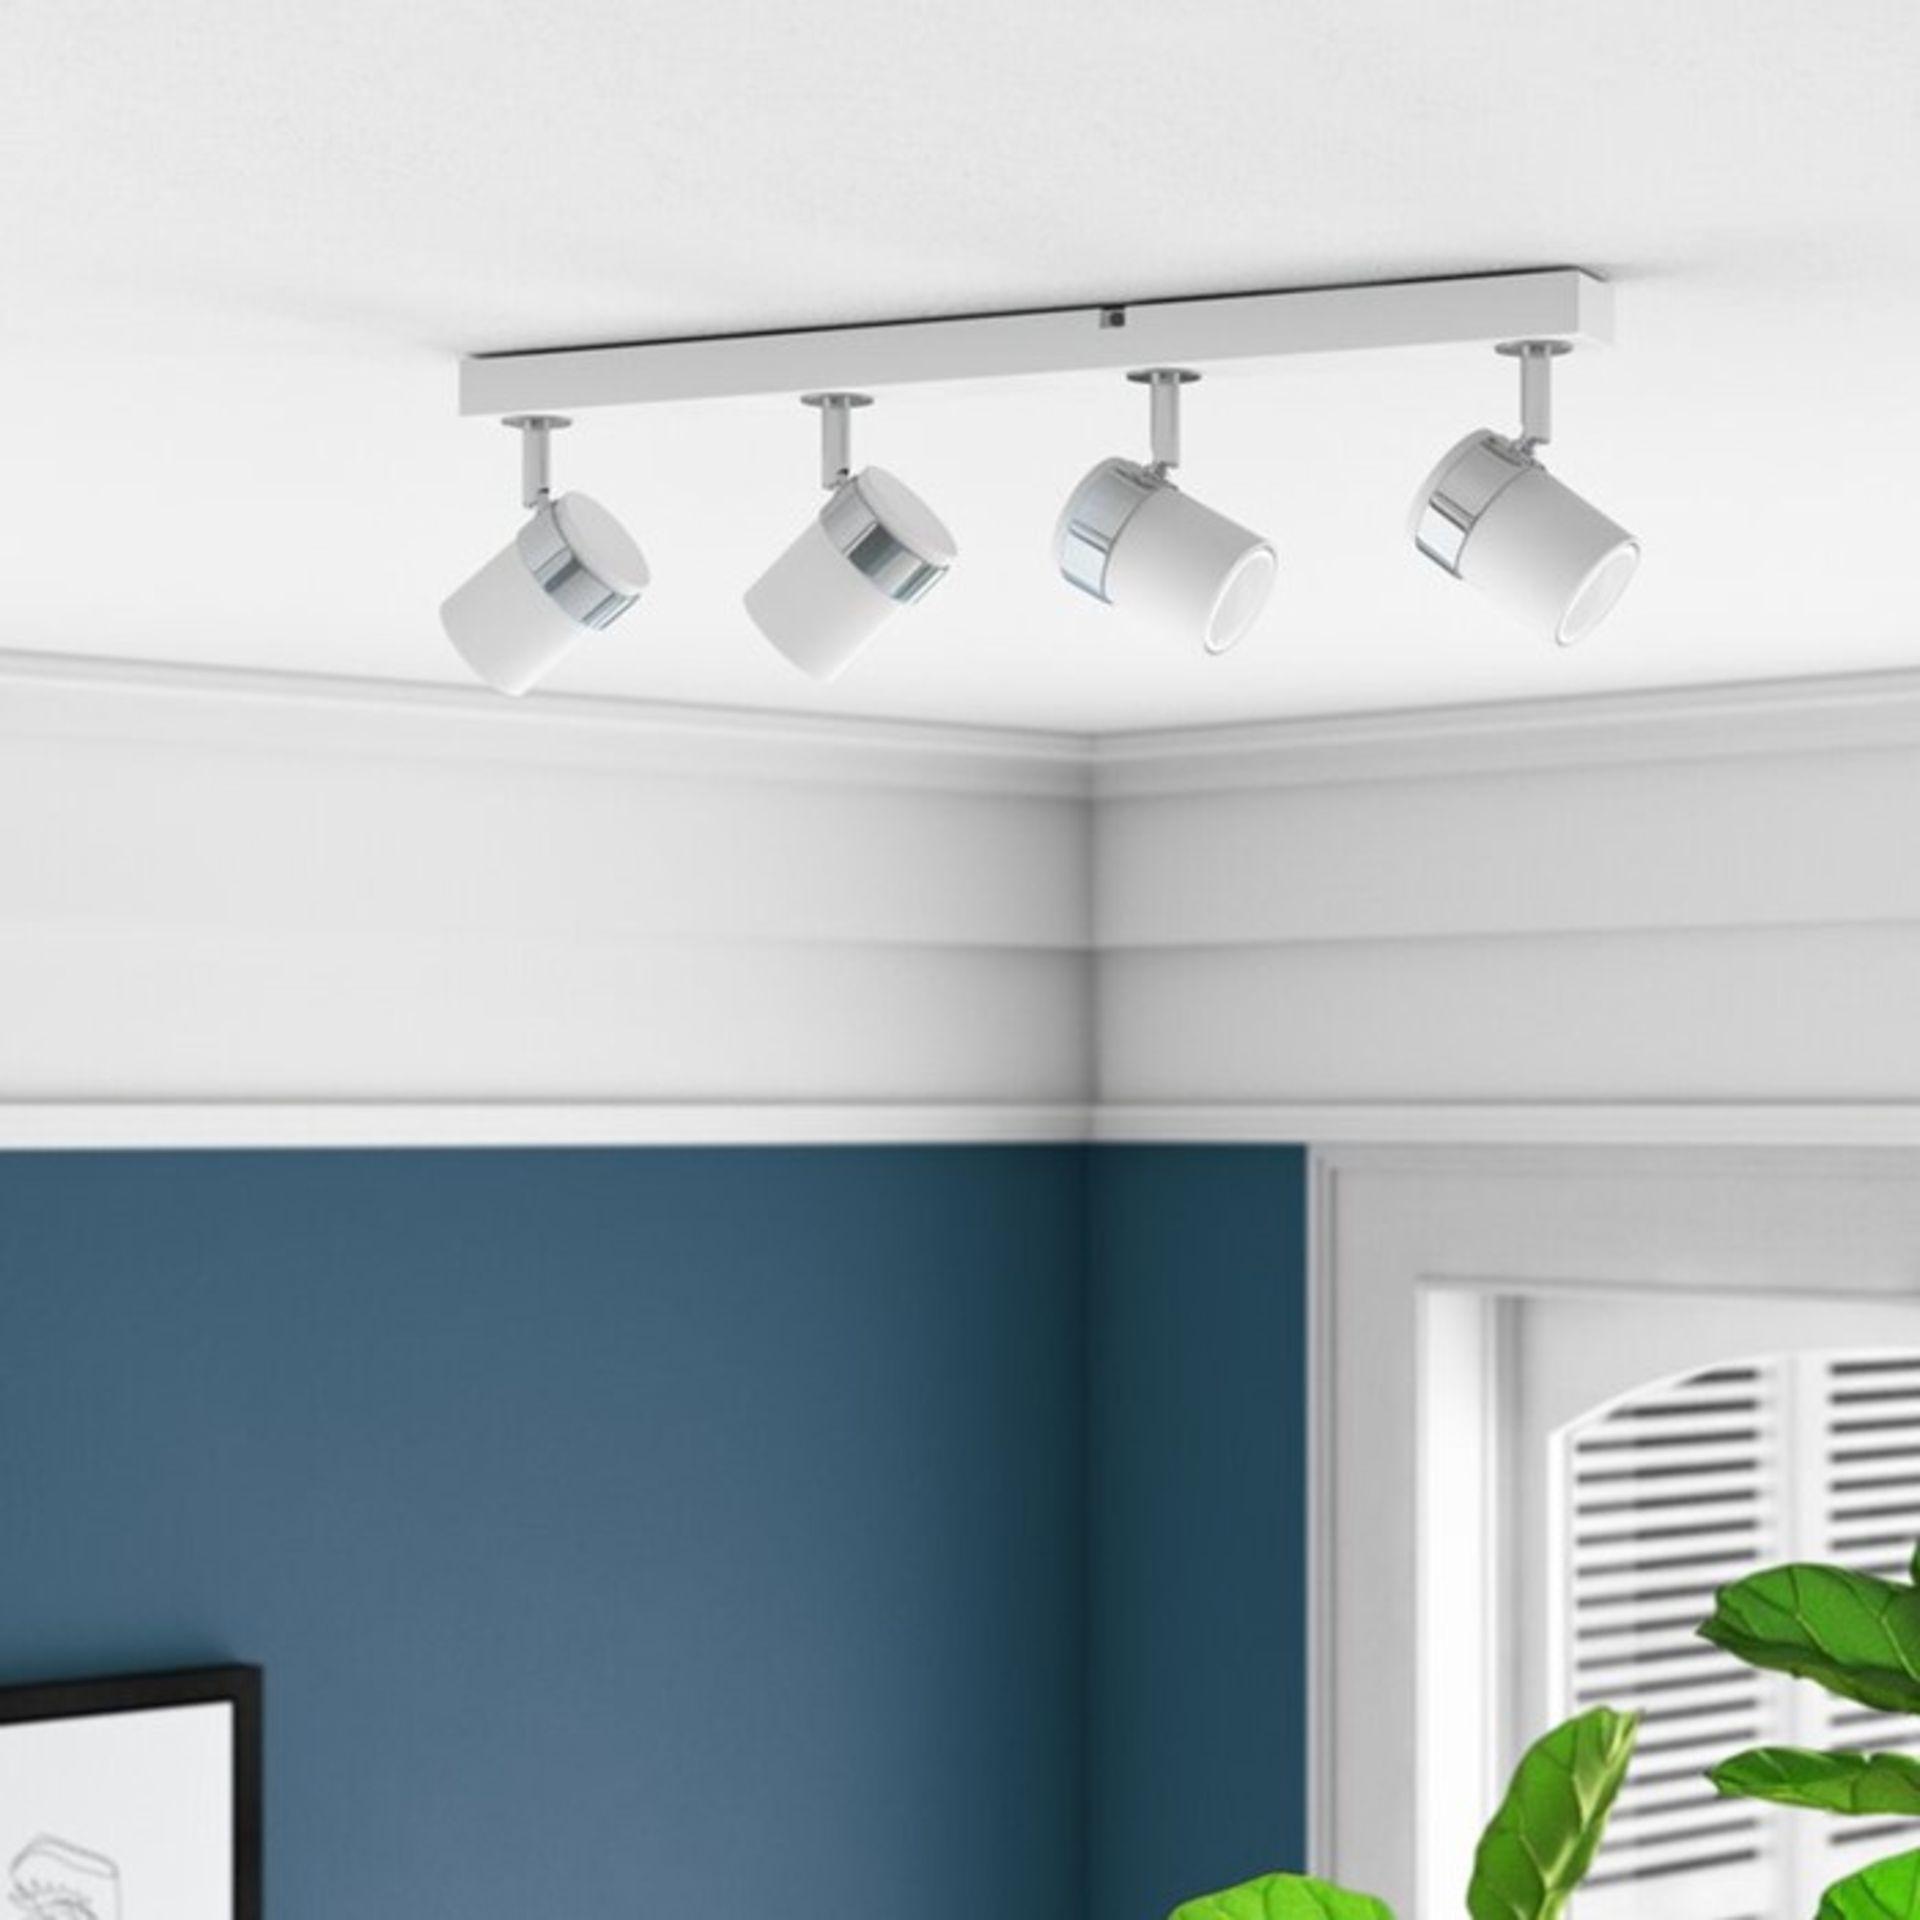 MiniSun, Rosie 4-Light Ceiling Spotlight (WHITE / 3 BULBS INCLUDED - MISSING ONE BULB) - RRP £35.